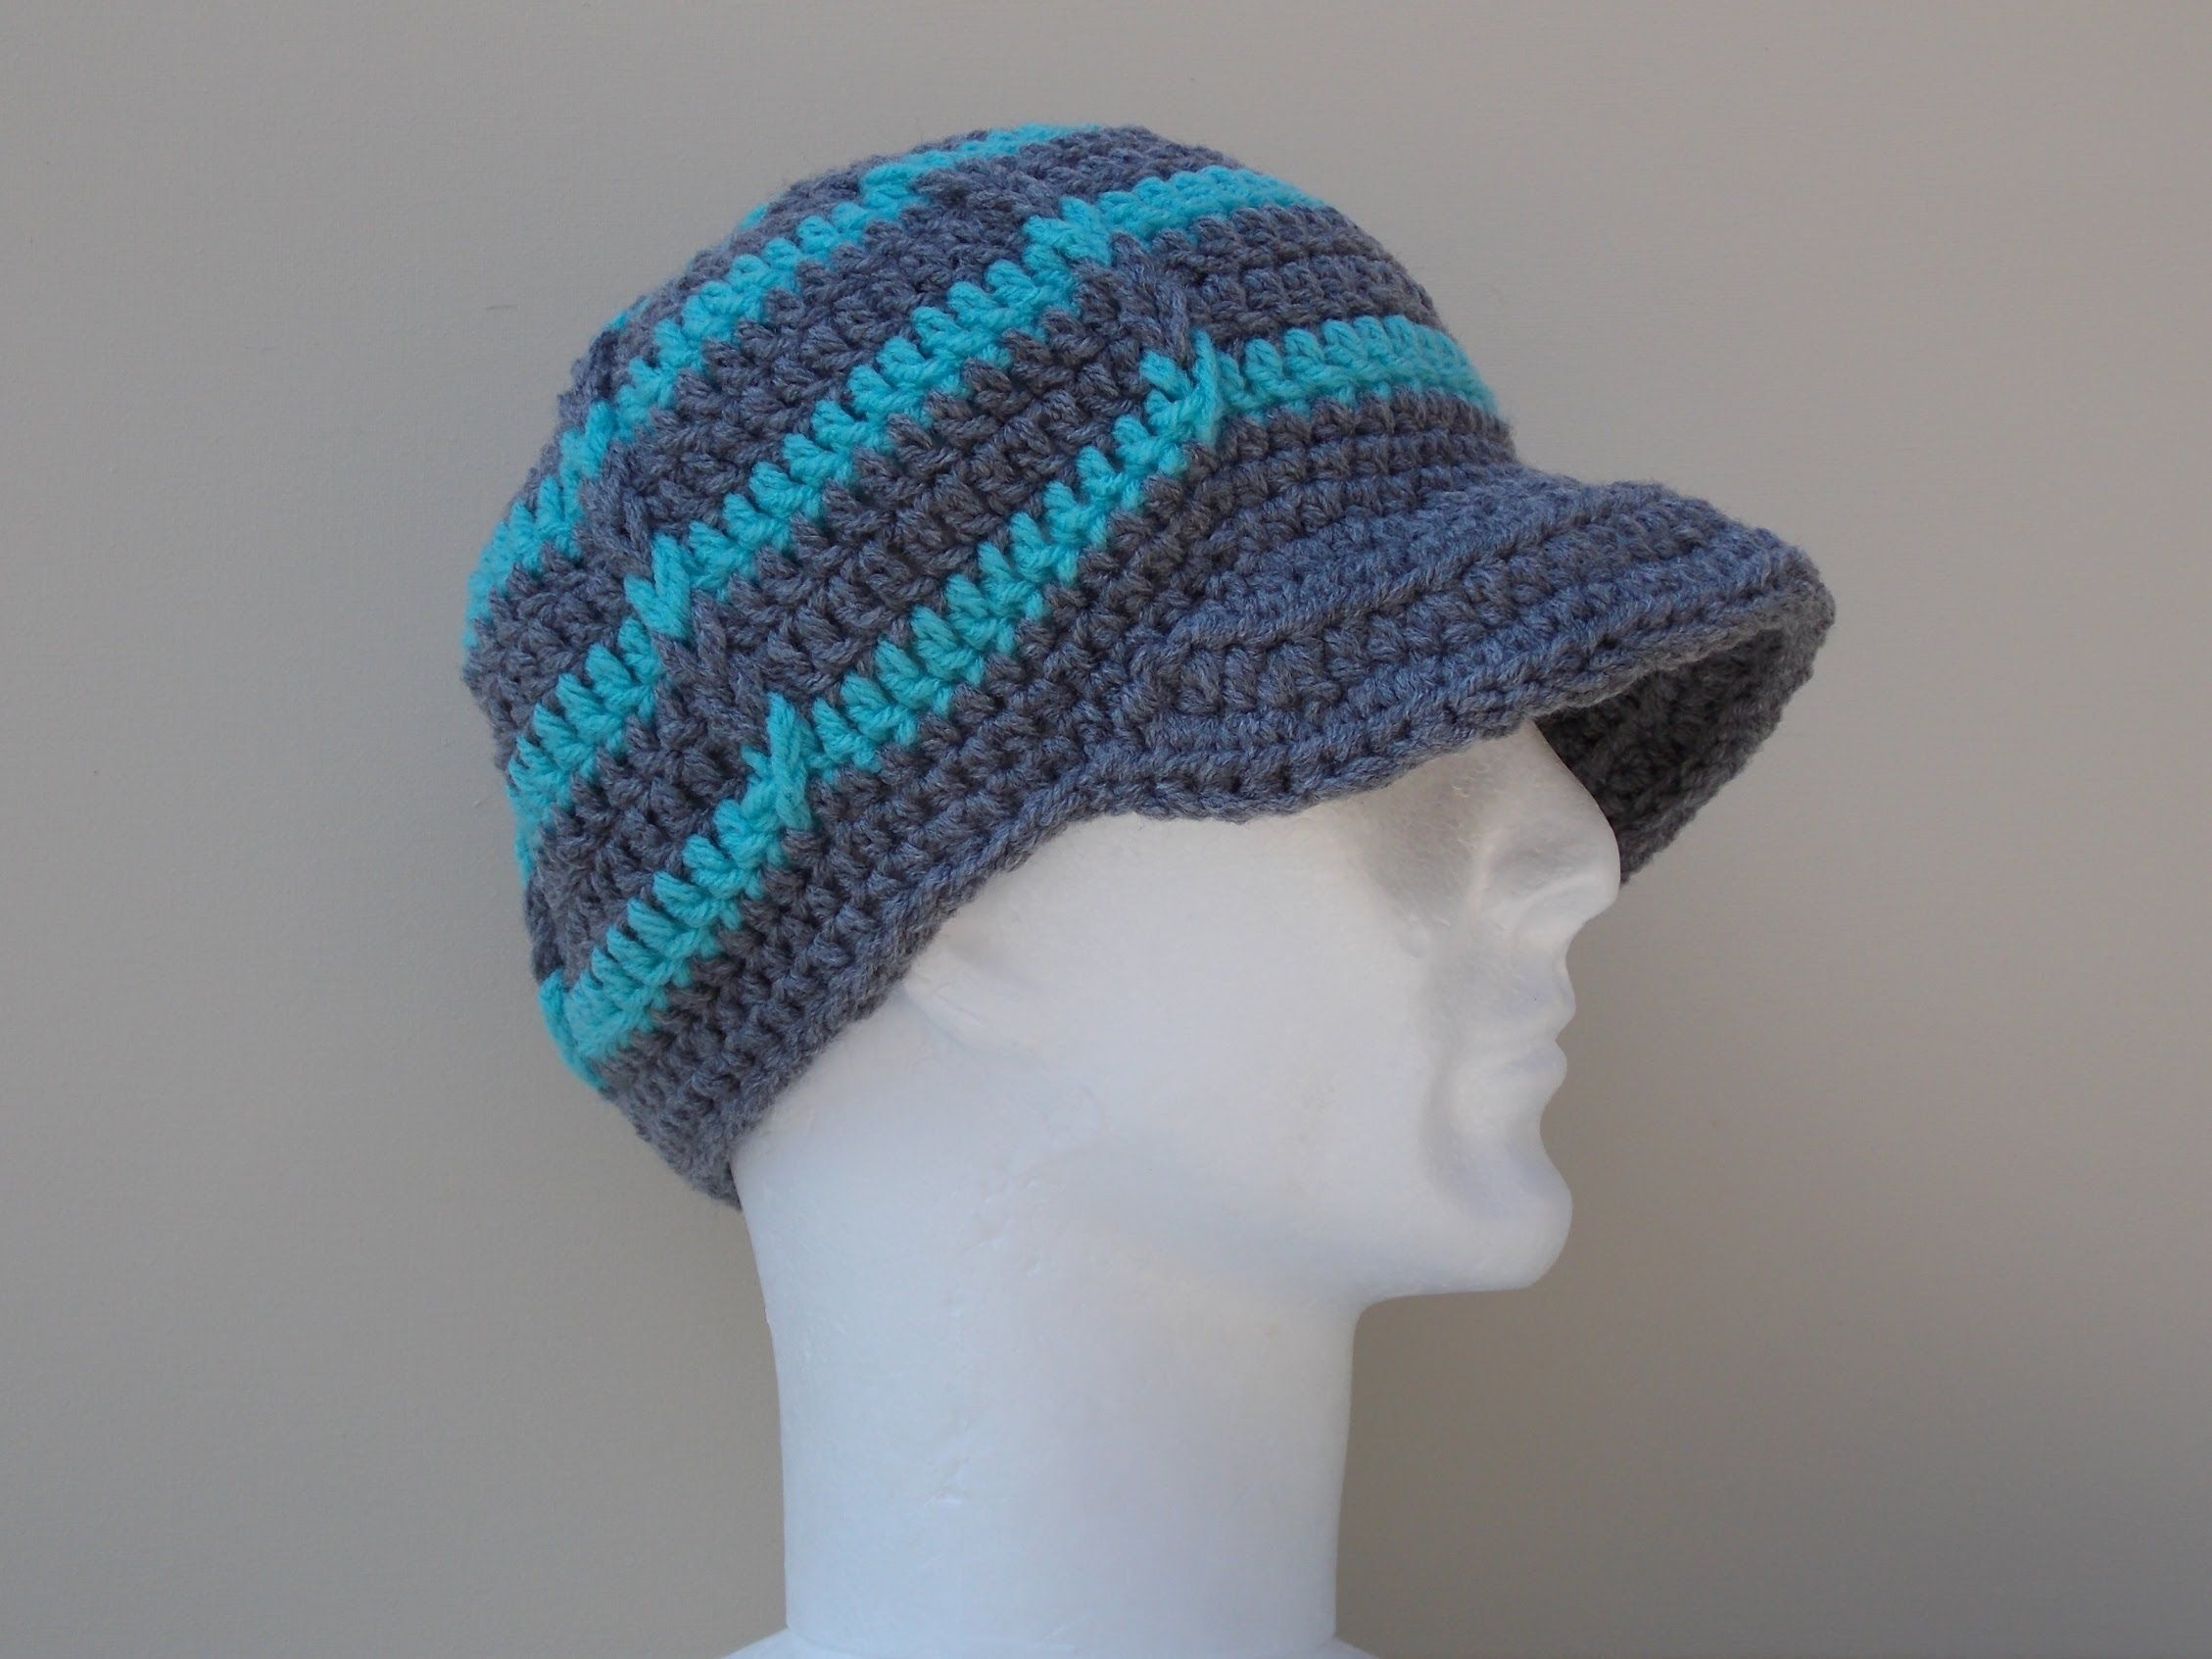 Hat Brim / Peak Crochet Tutorial. How to add a brim to a crochet hat ...